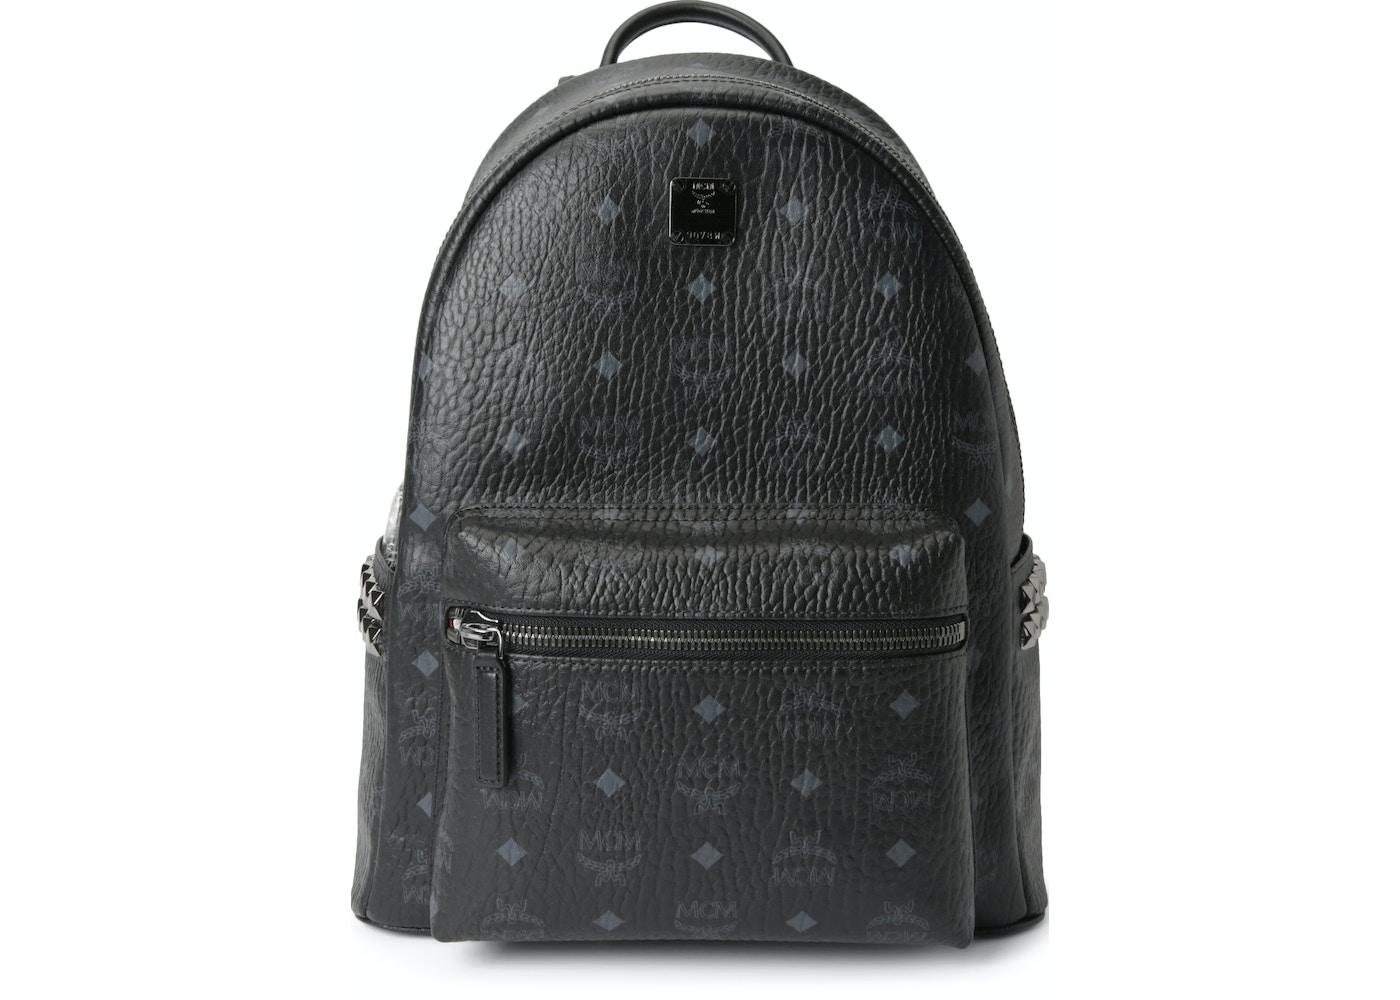 de4ca8c72f85 MCM Stark Backpack Visetos Side Studs Small/Medium Black